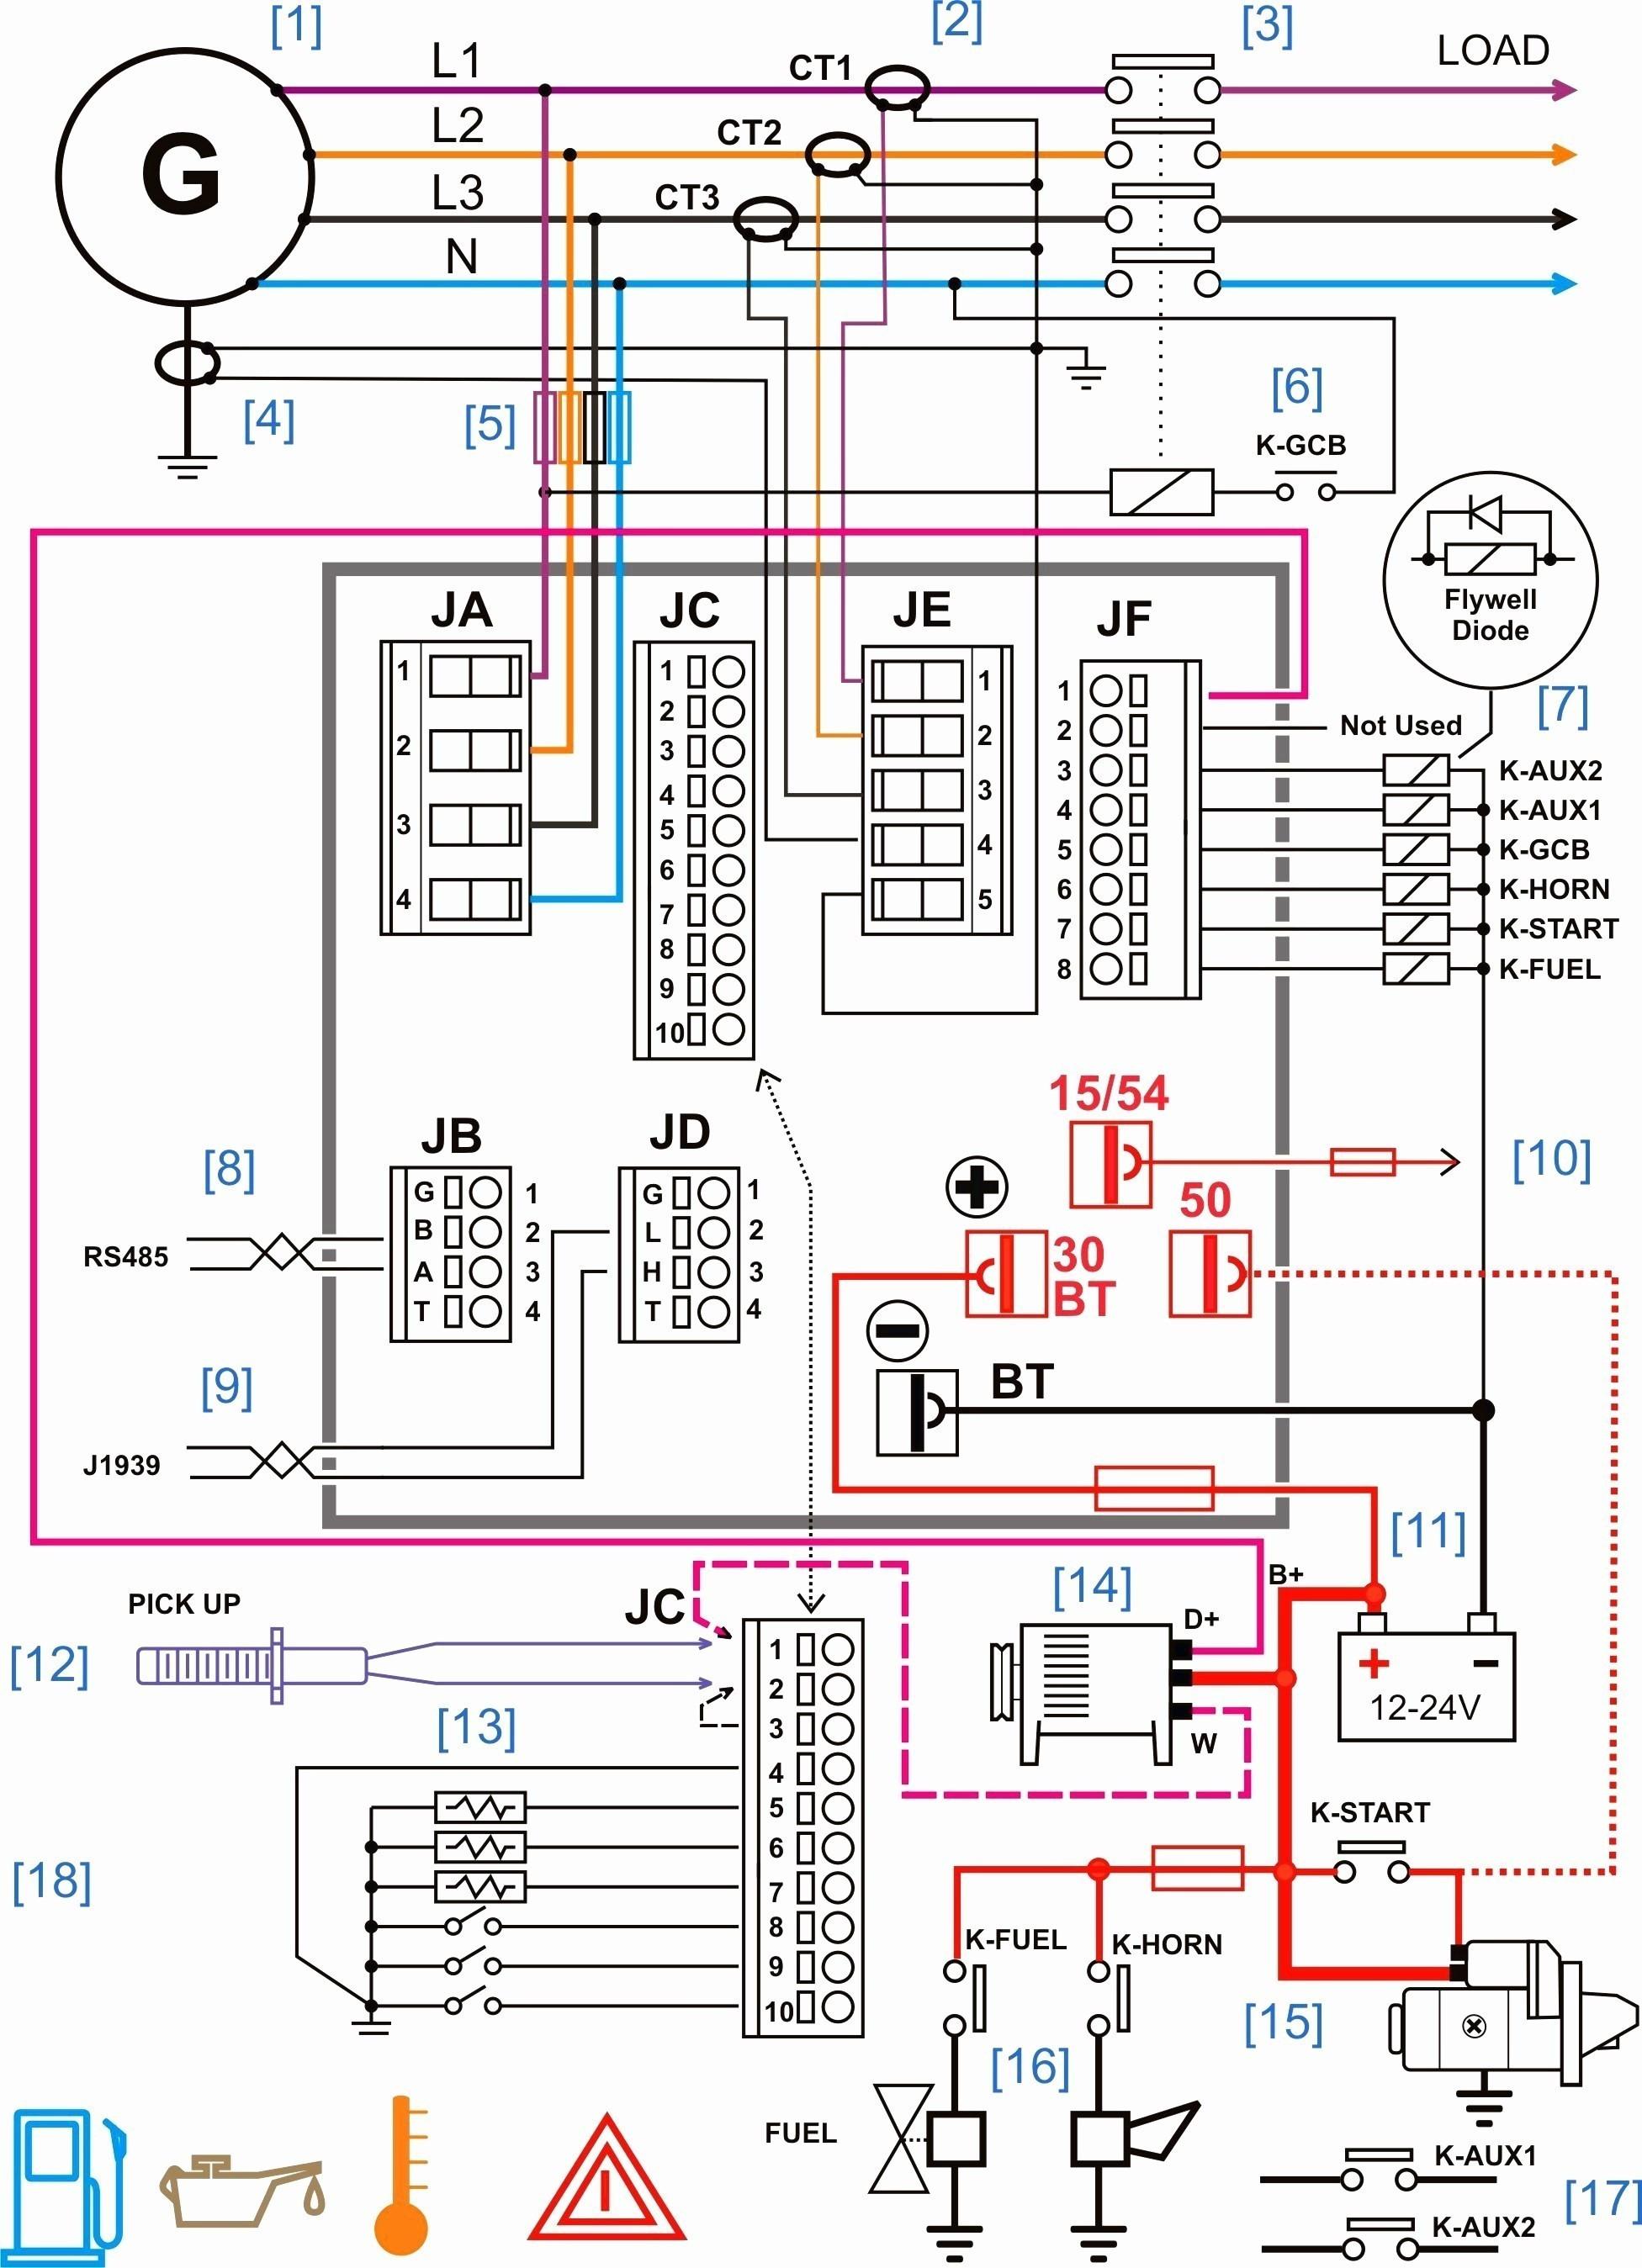 Car Light Wiring Diagram Save Audi A4 Cd Player Wiring Diagram Of Car Light Wiring Diagram